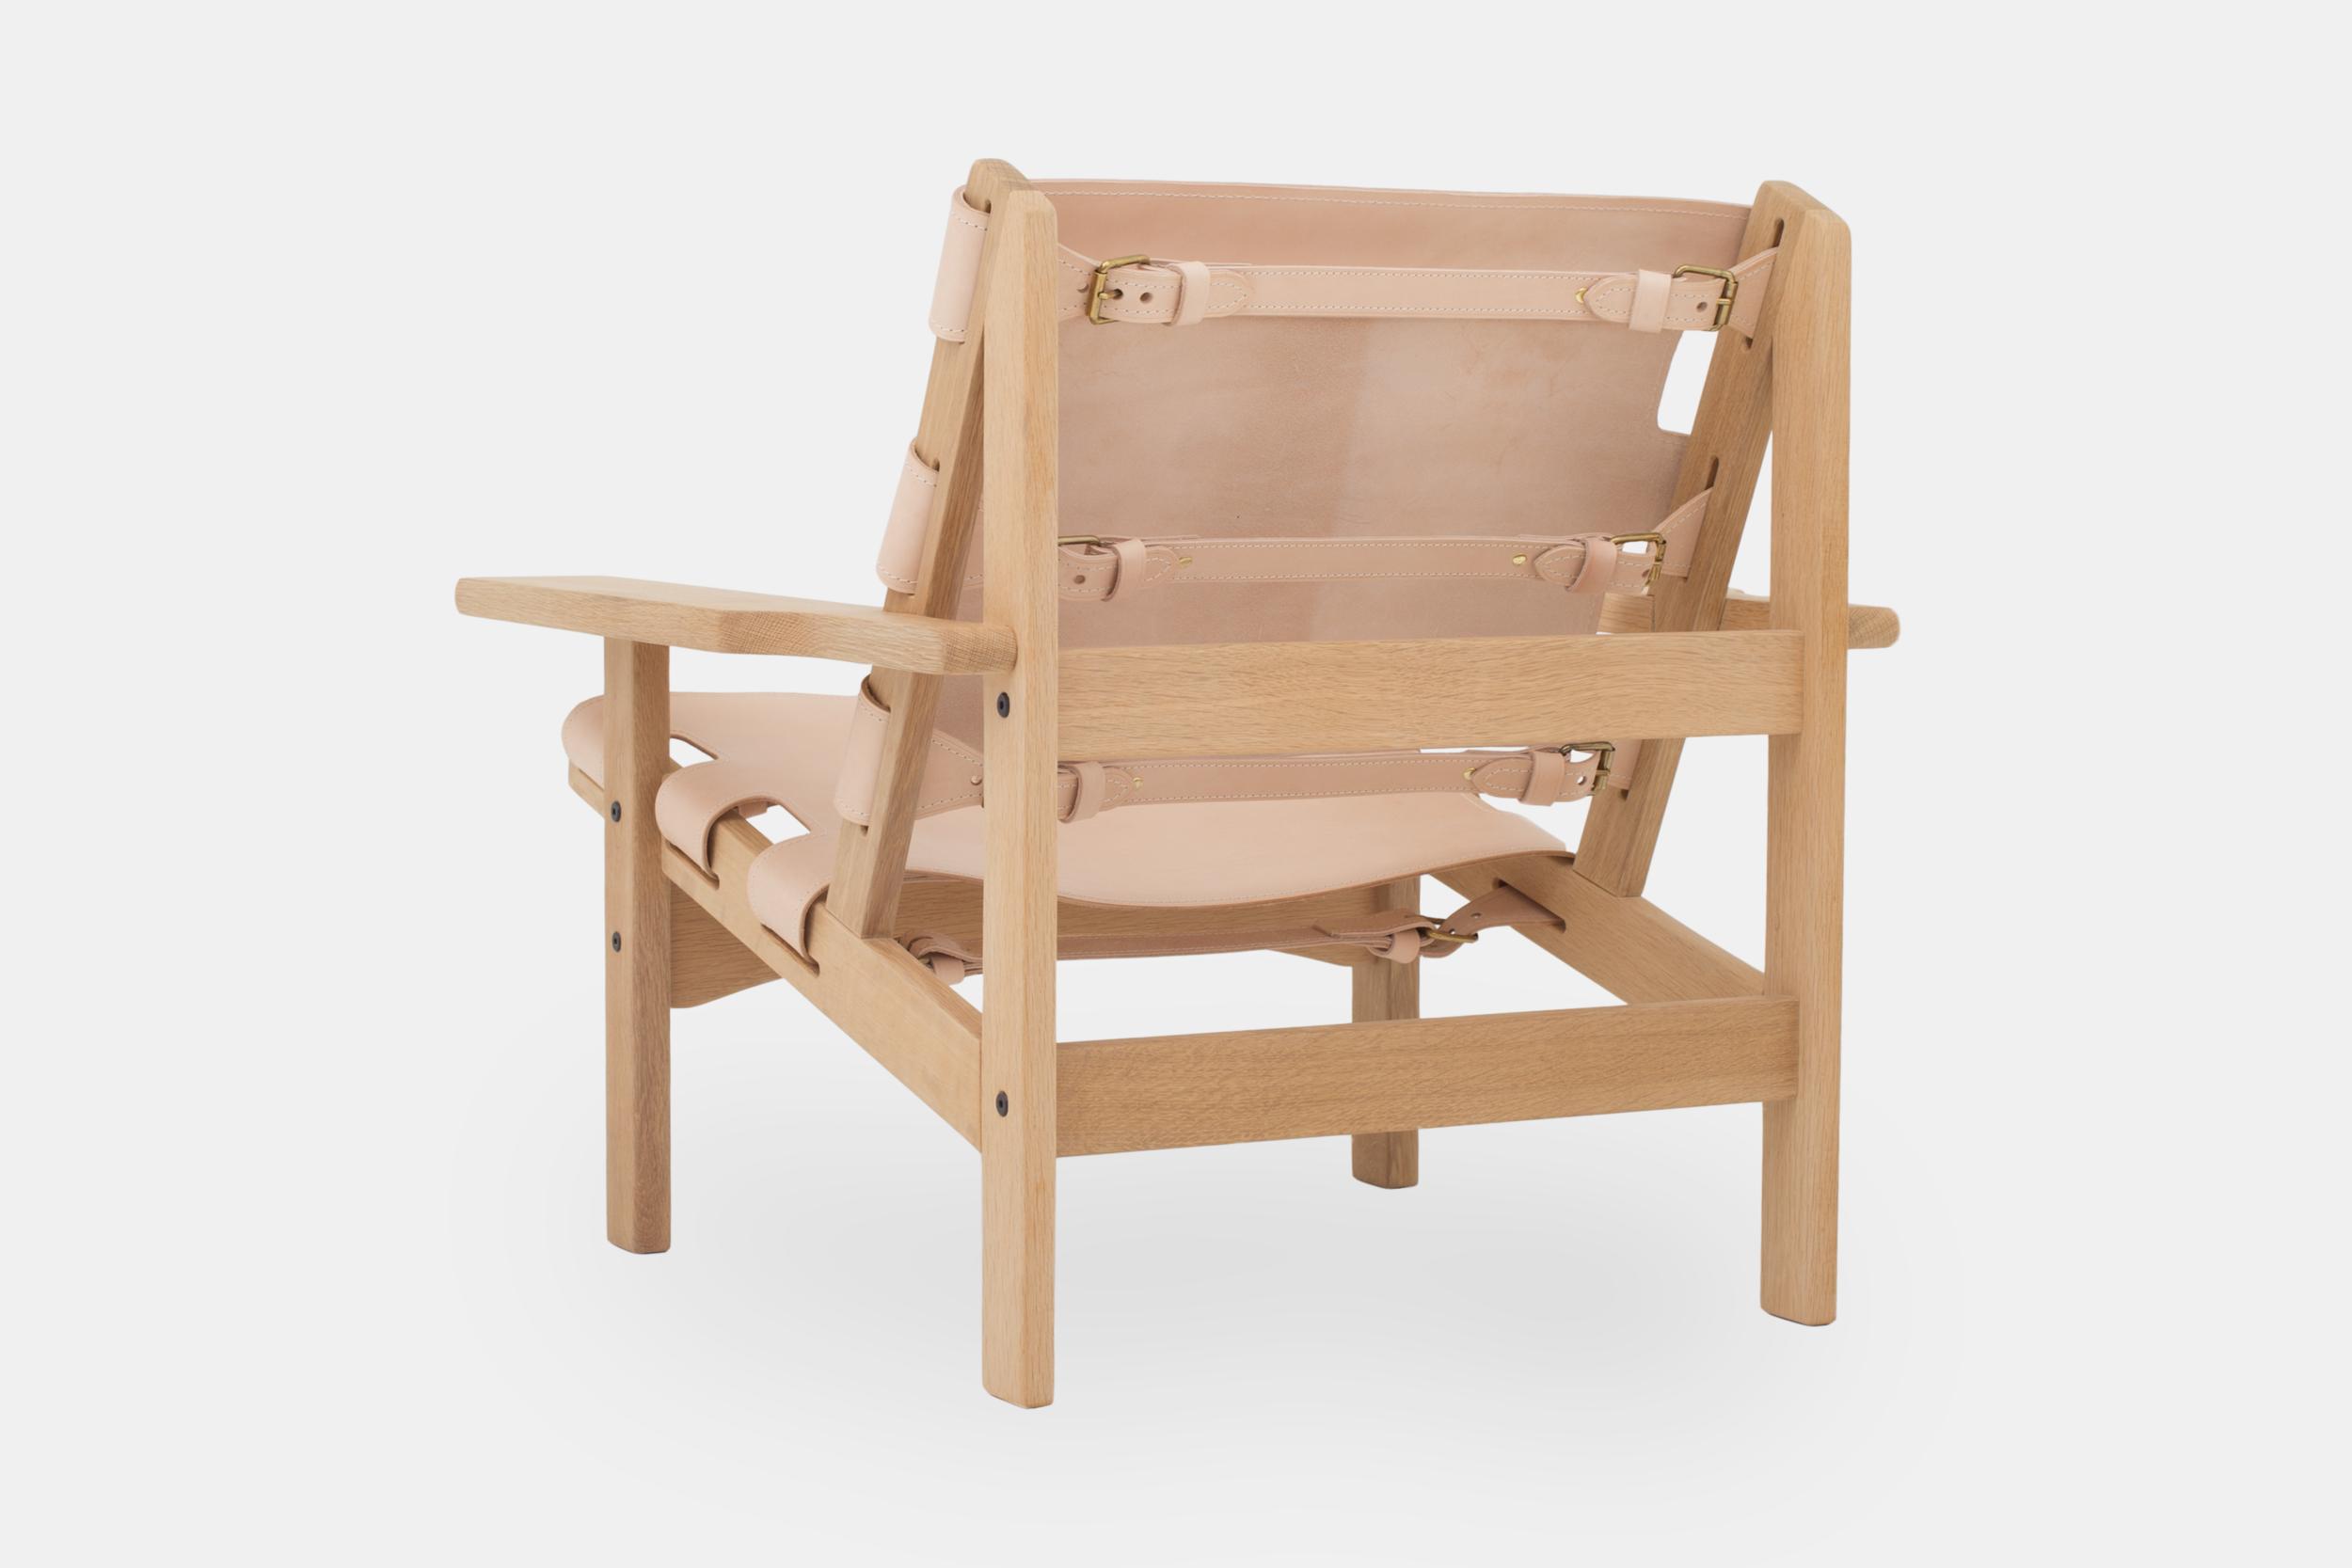 hunting-chair-light-oak-3.png